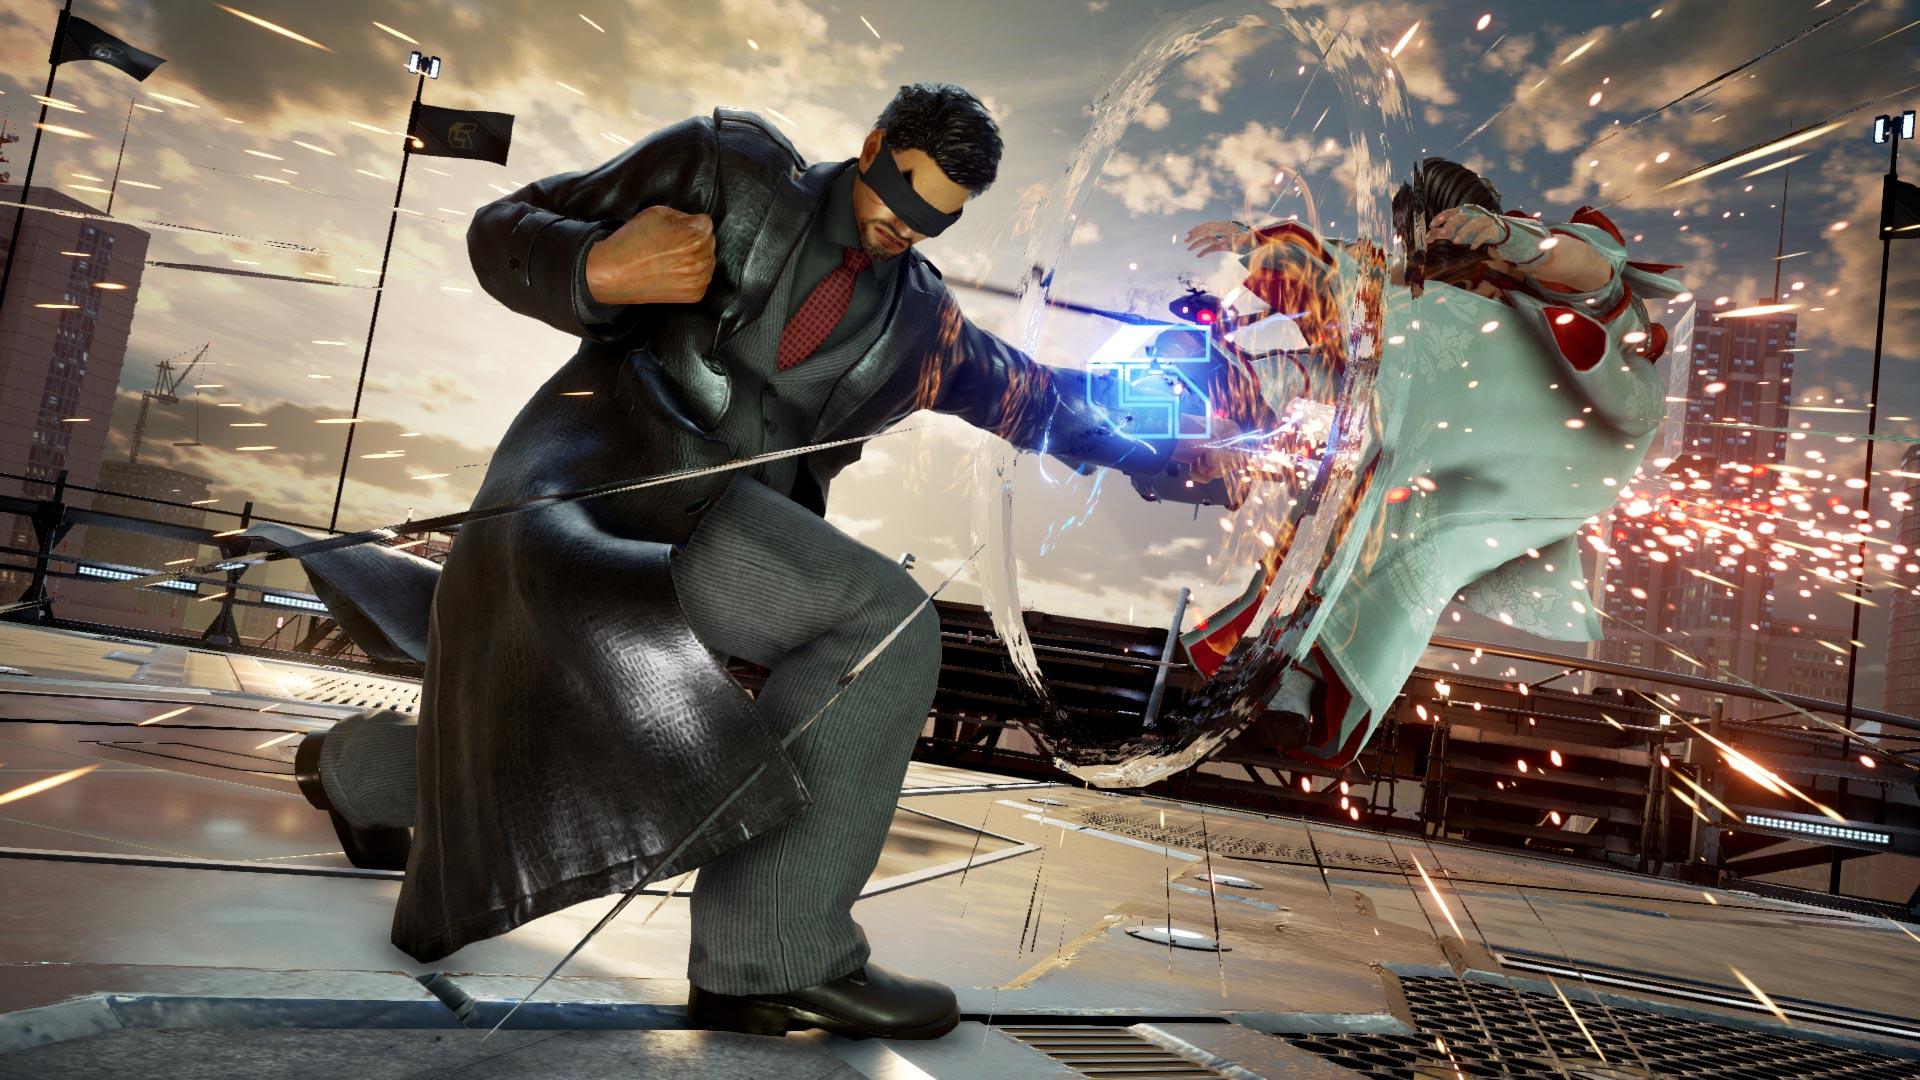 Tekken Season 3 accessories 2 out of 4 image gallery